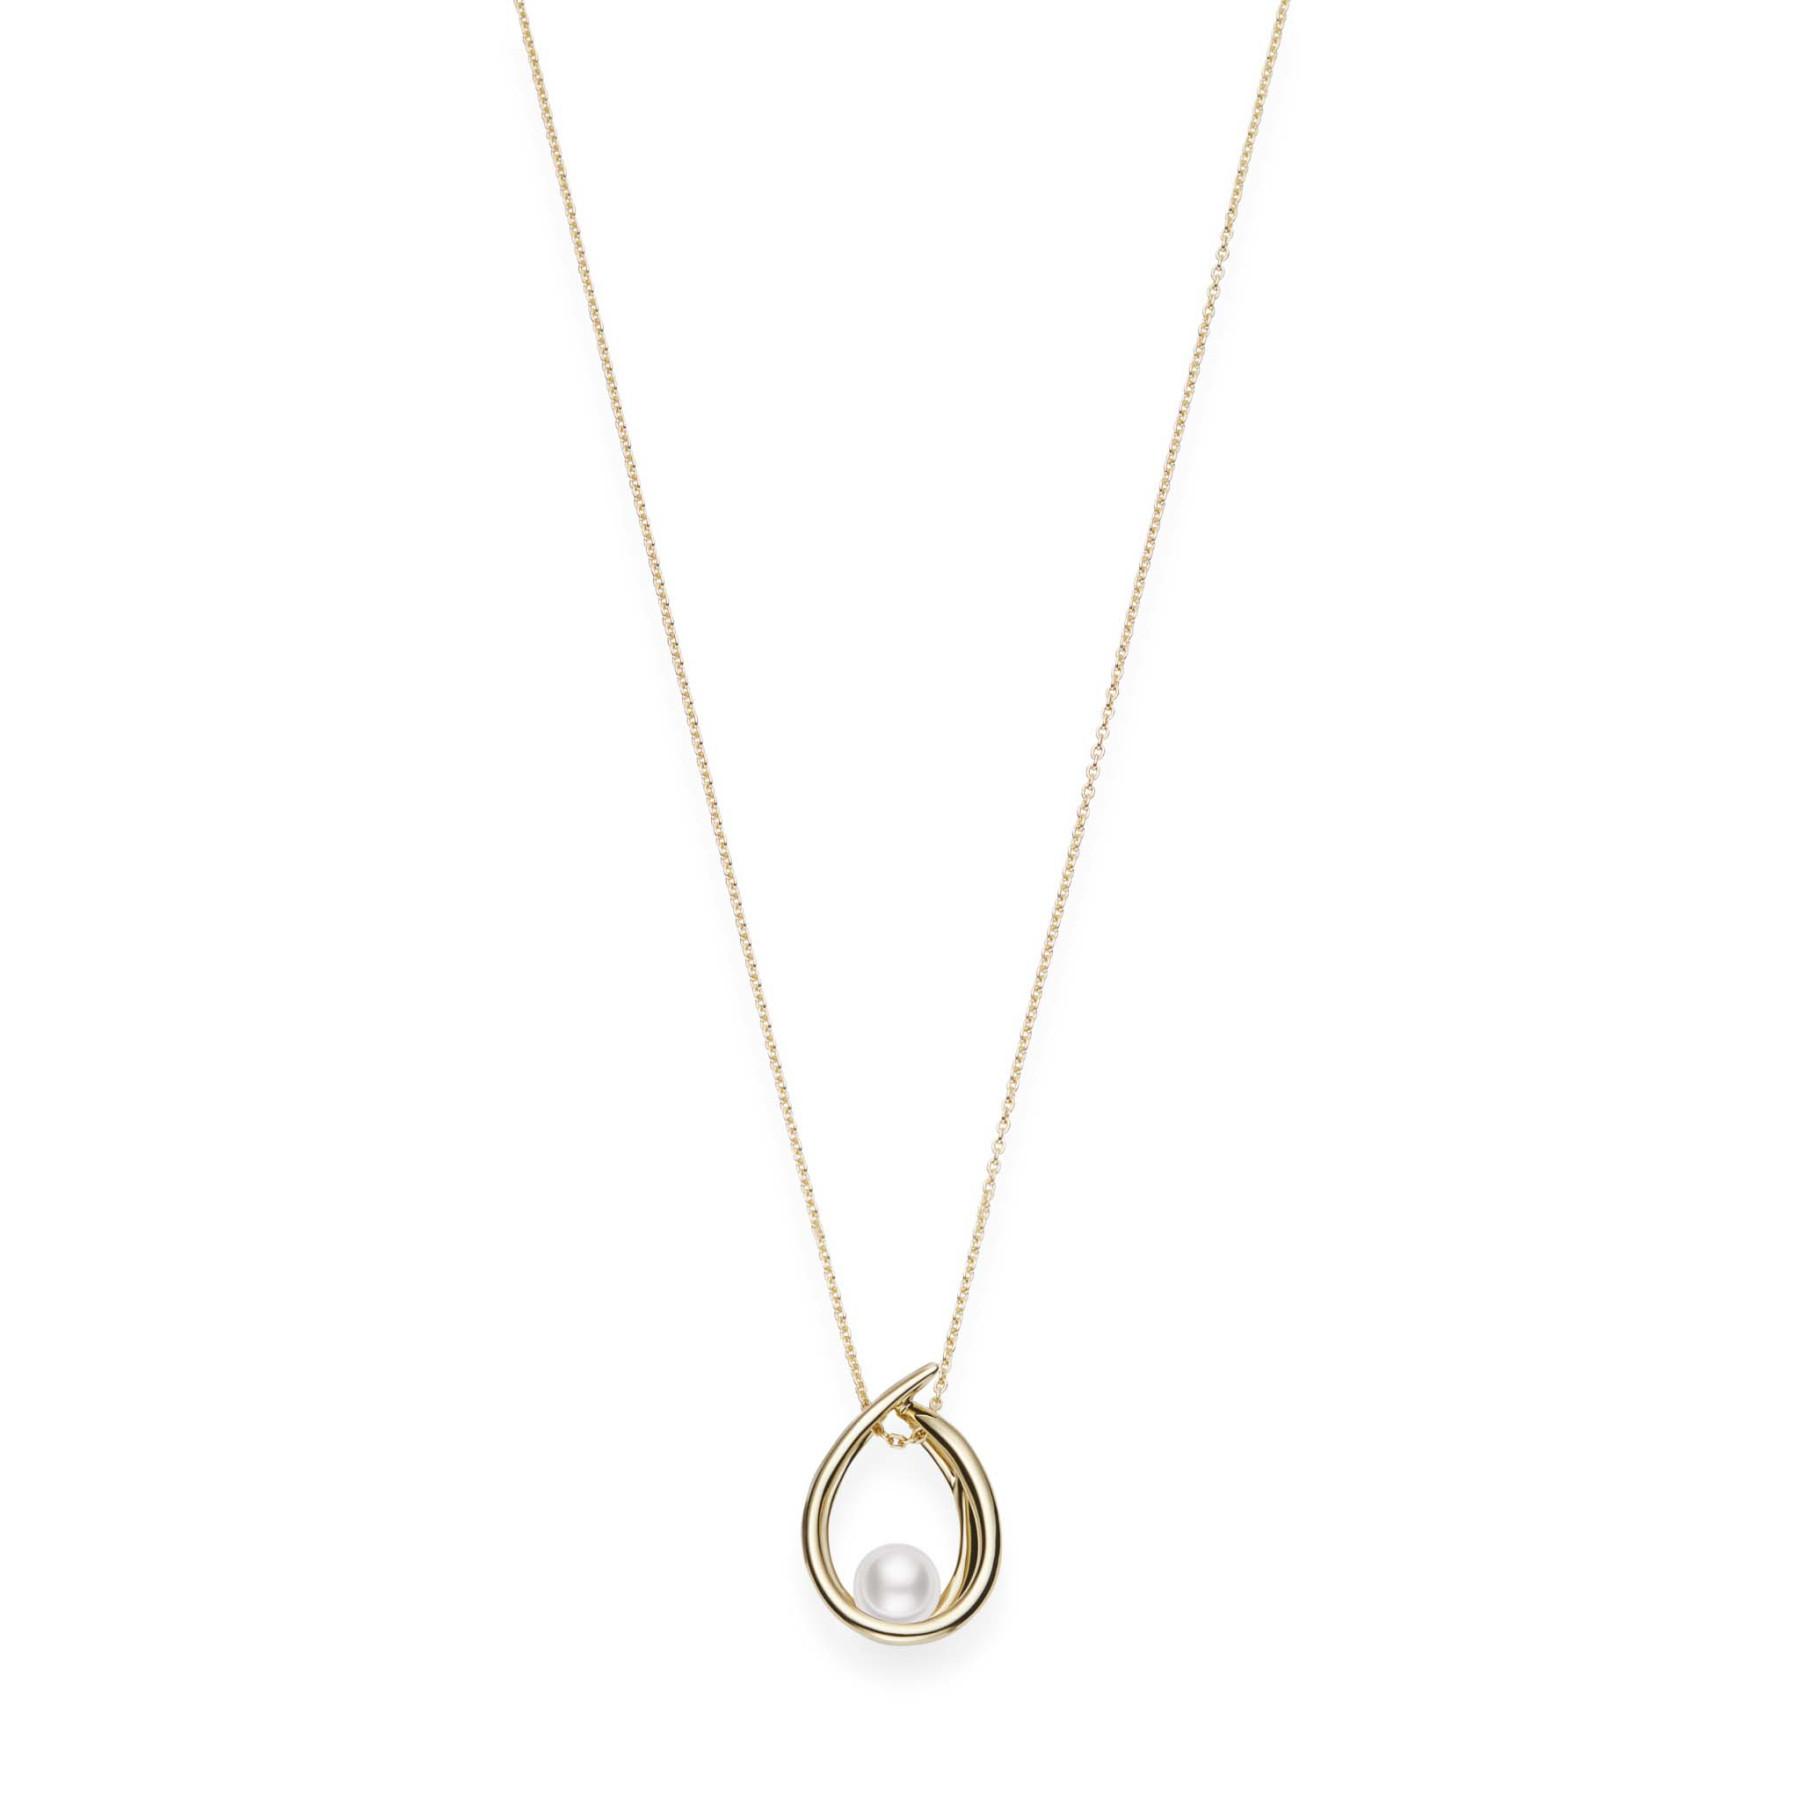 Mikimoto 18kt Yellow Gold Teardrop Akoya Pearl Necklace